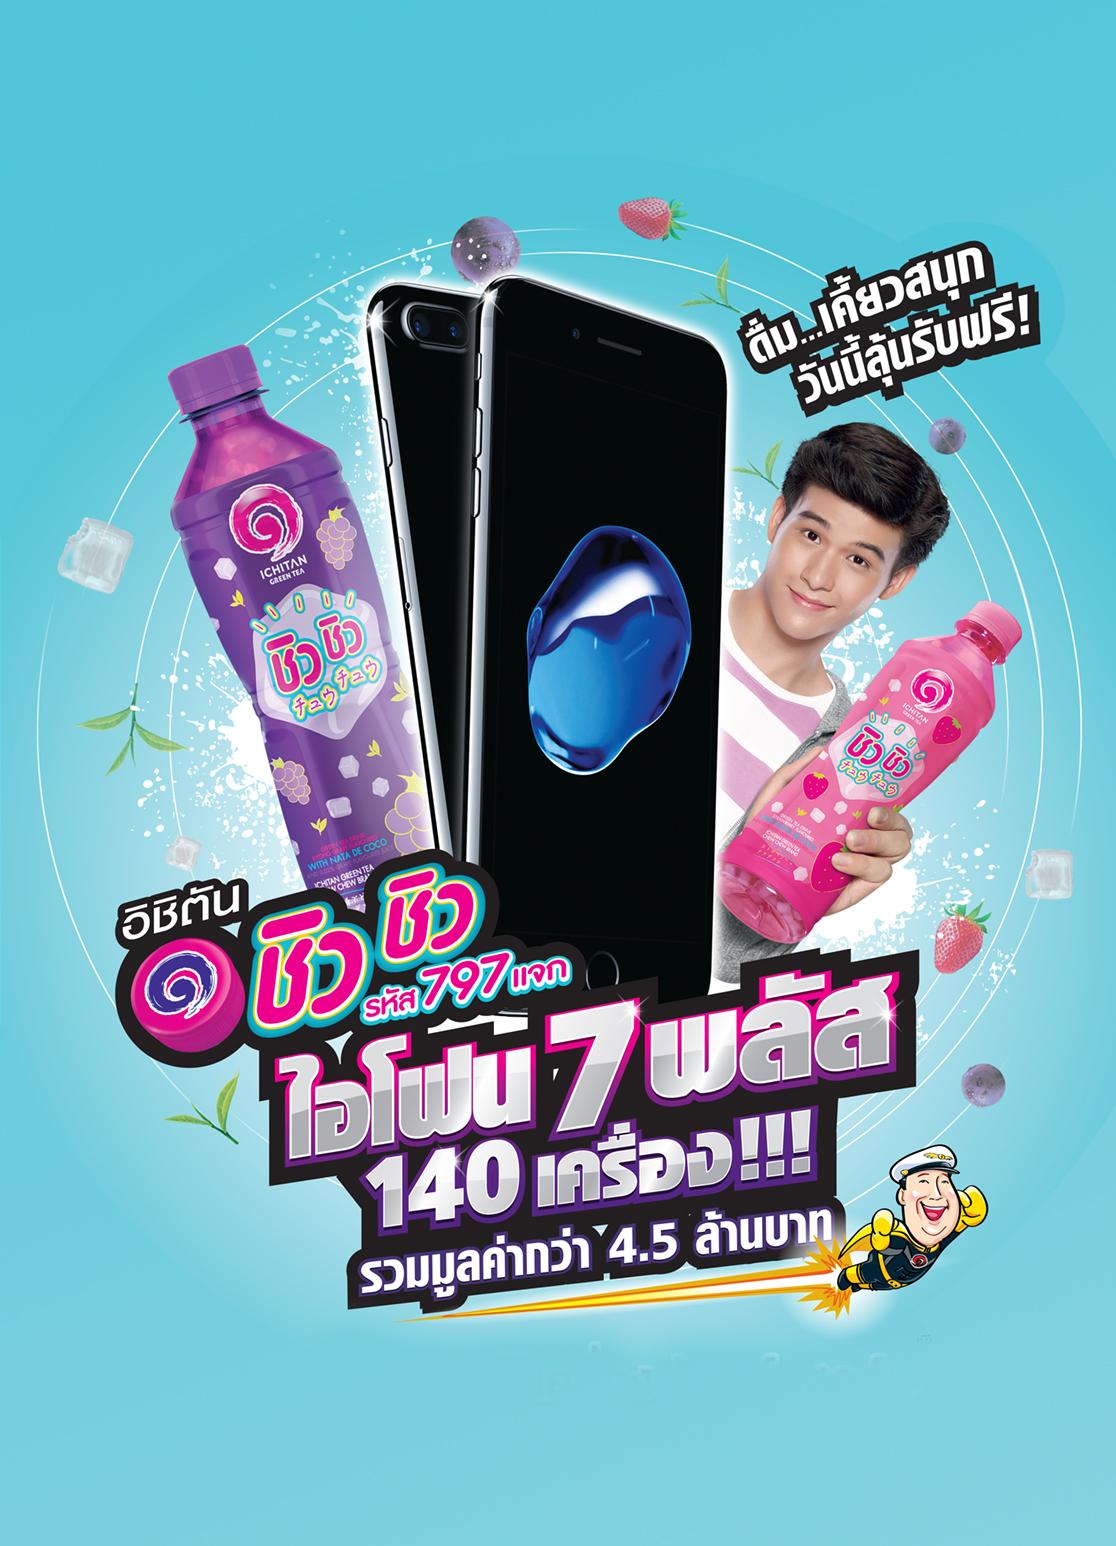 Final_KV Chew Chew_Iphone 7Plus